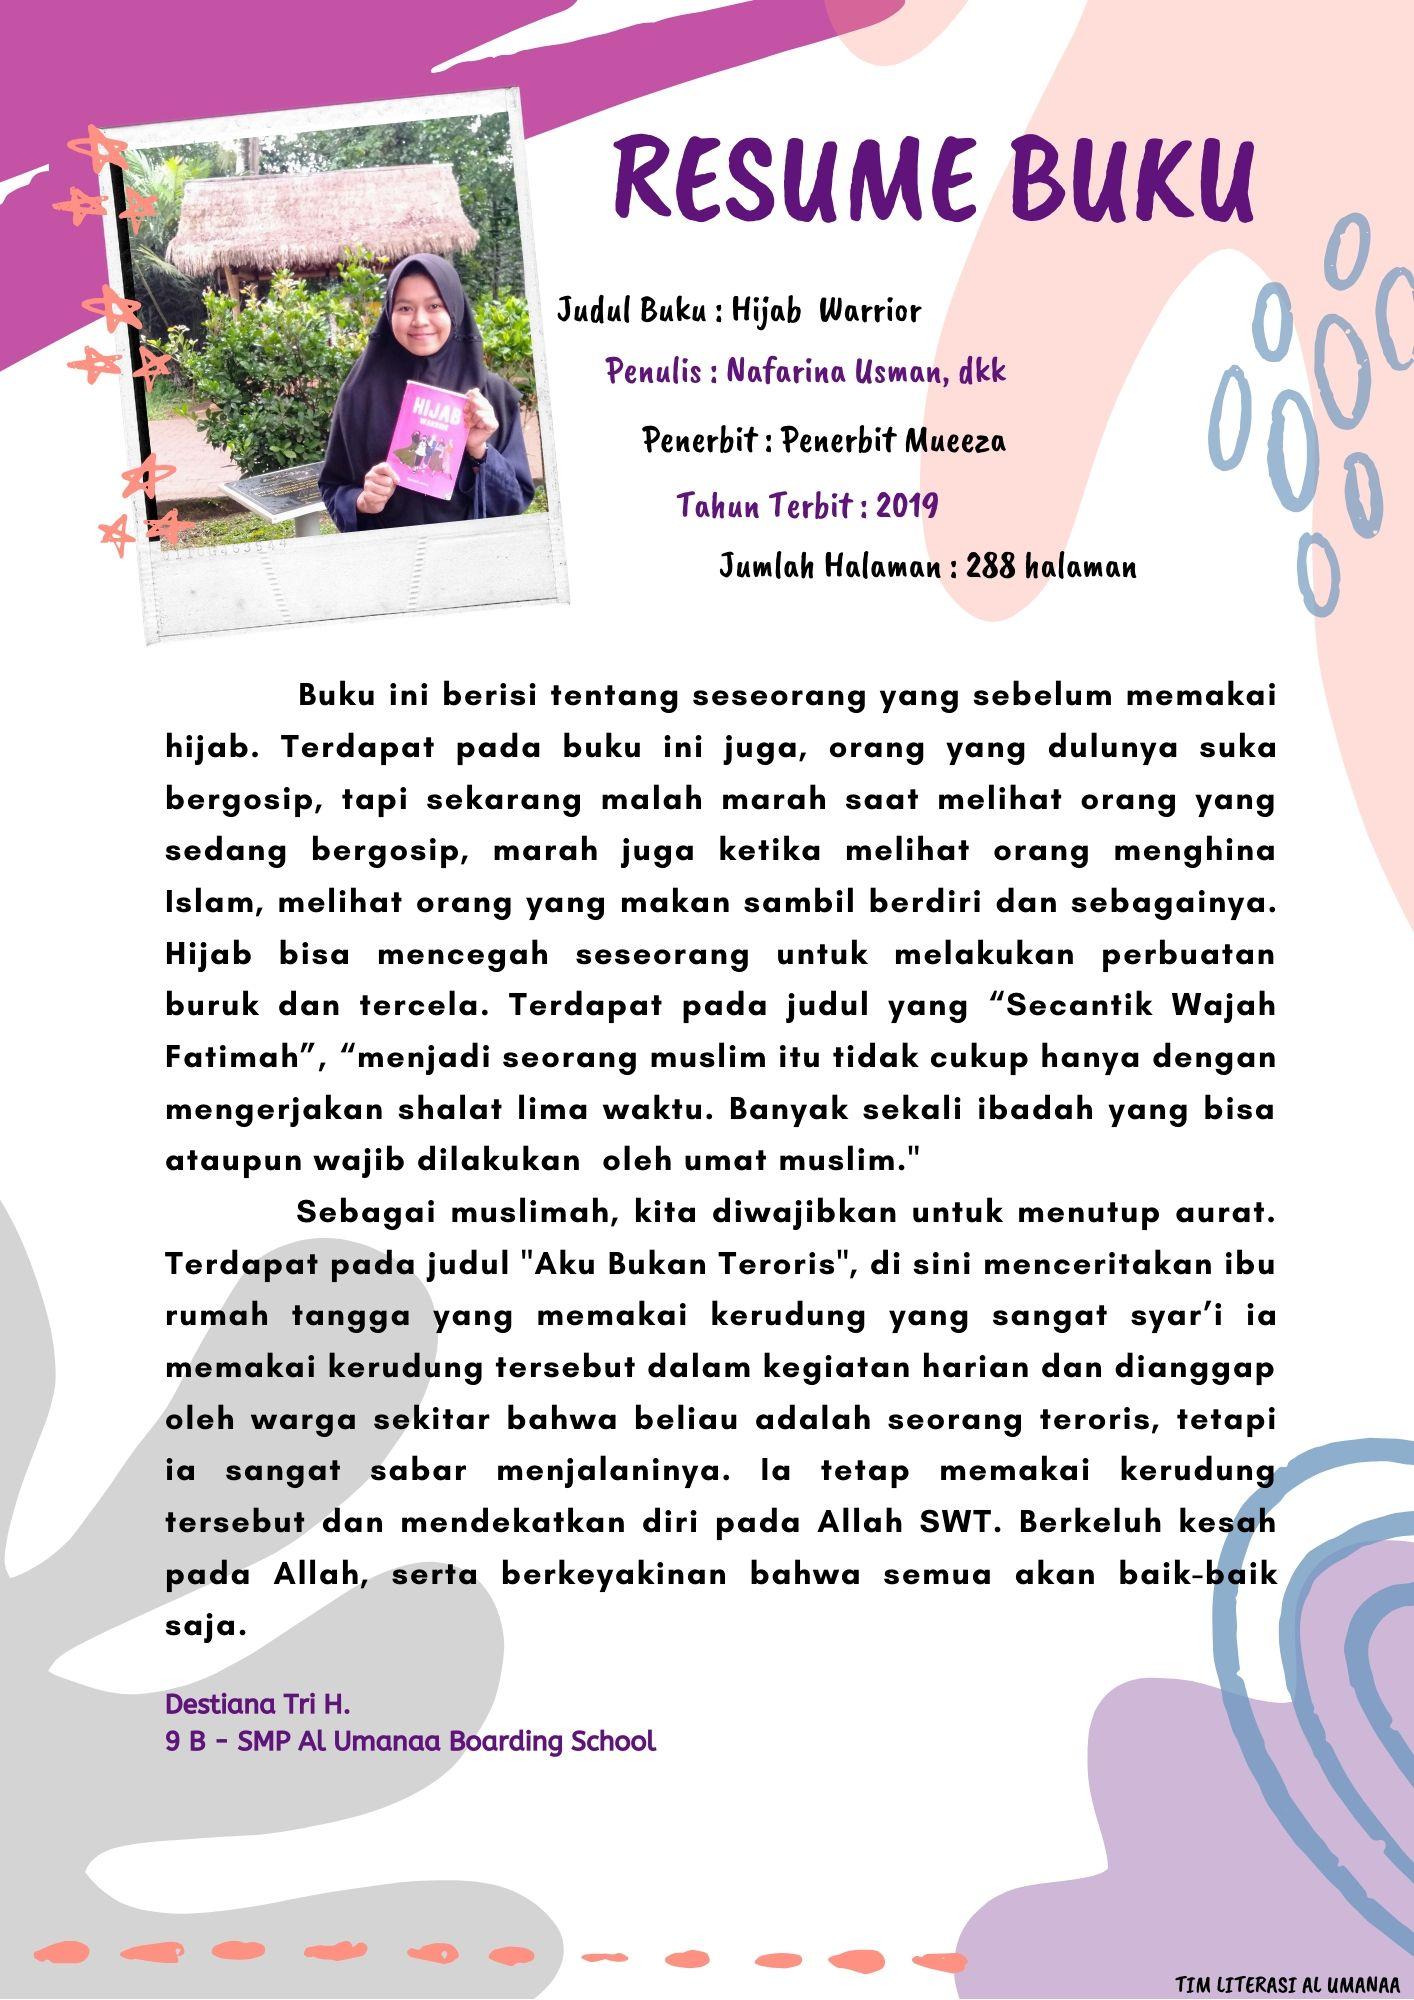 Resume Buku: Hijab Warrior